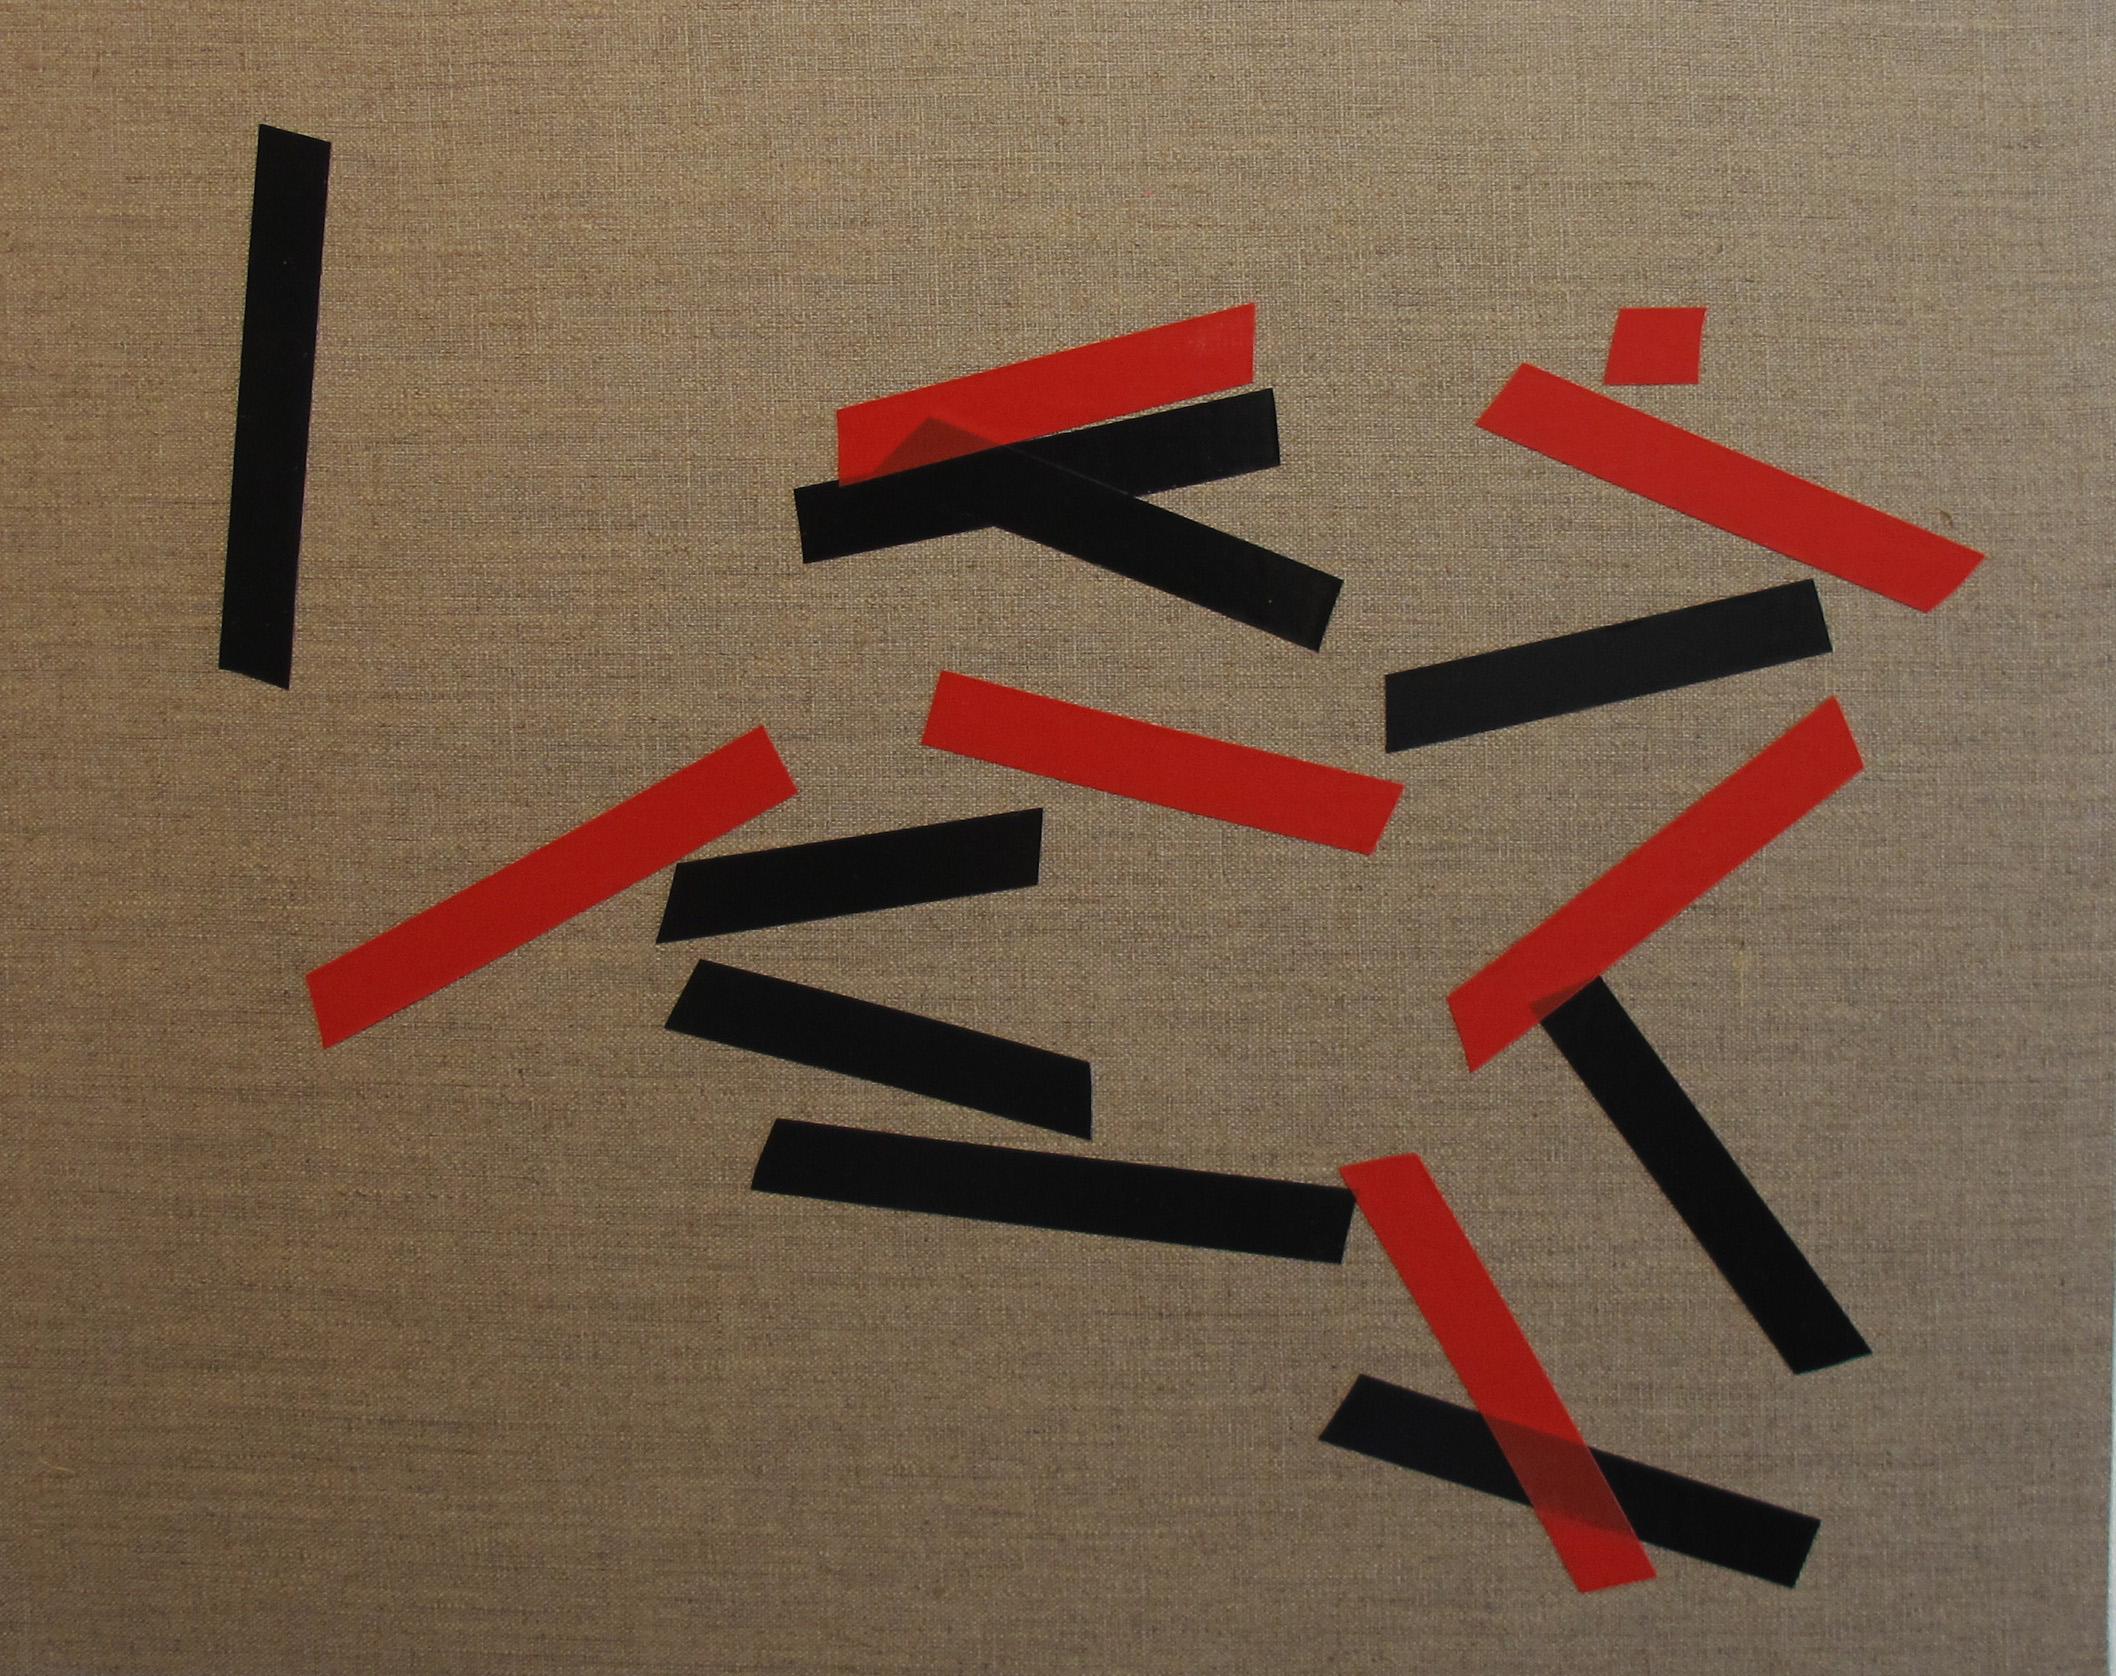 Billy Gruner,  Folk-Tape work No. 5 , 2012, electrical tape, linen artboard, 40 x 50cm